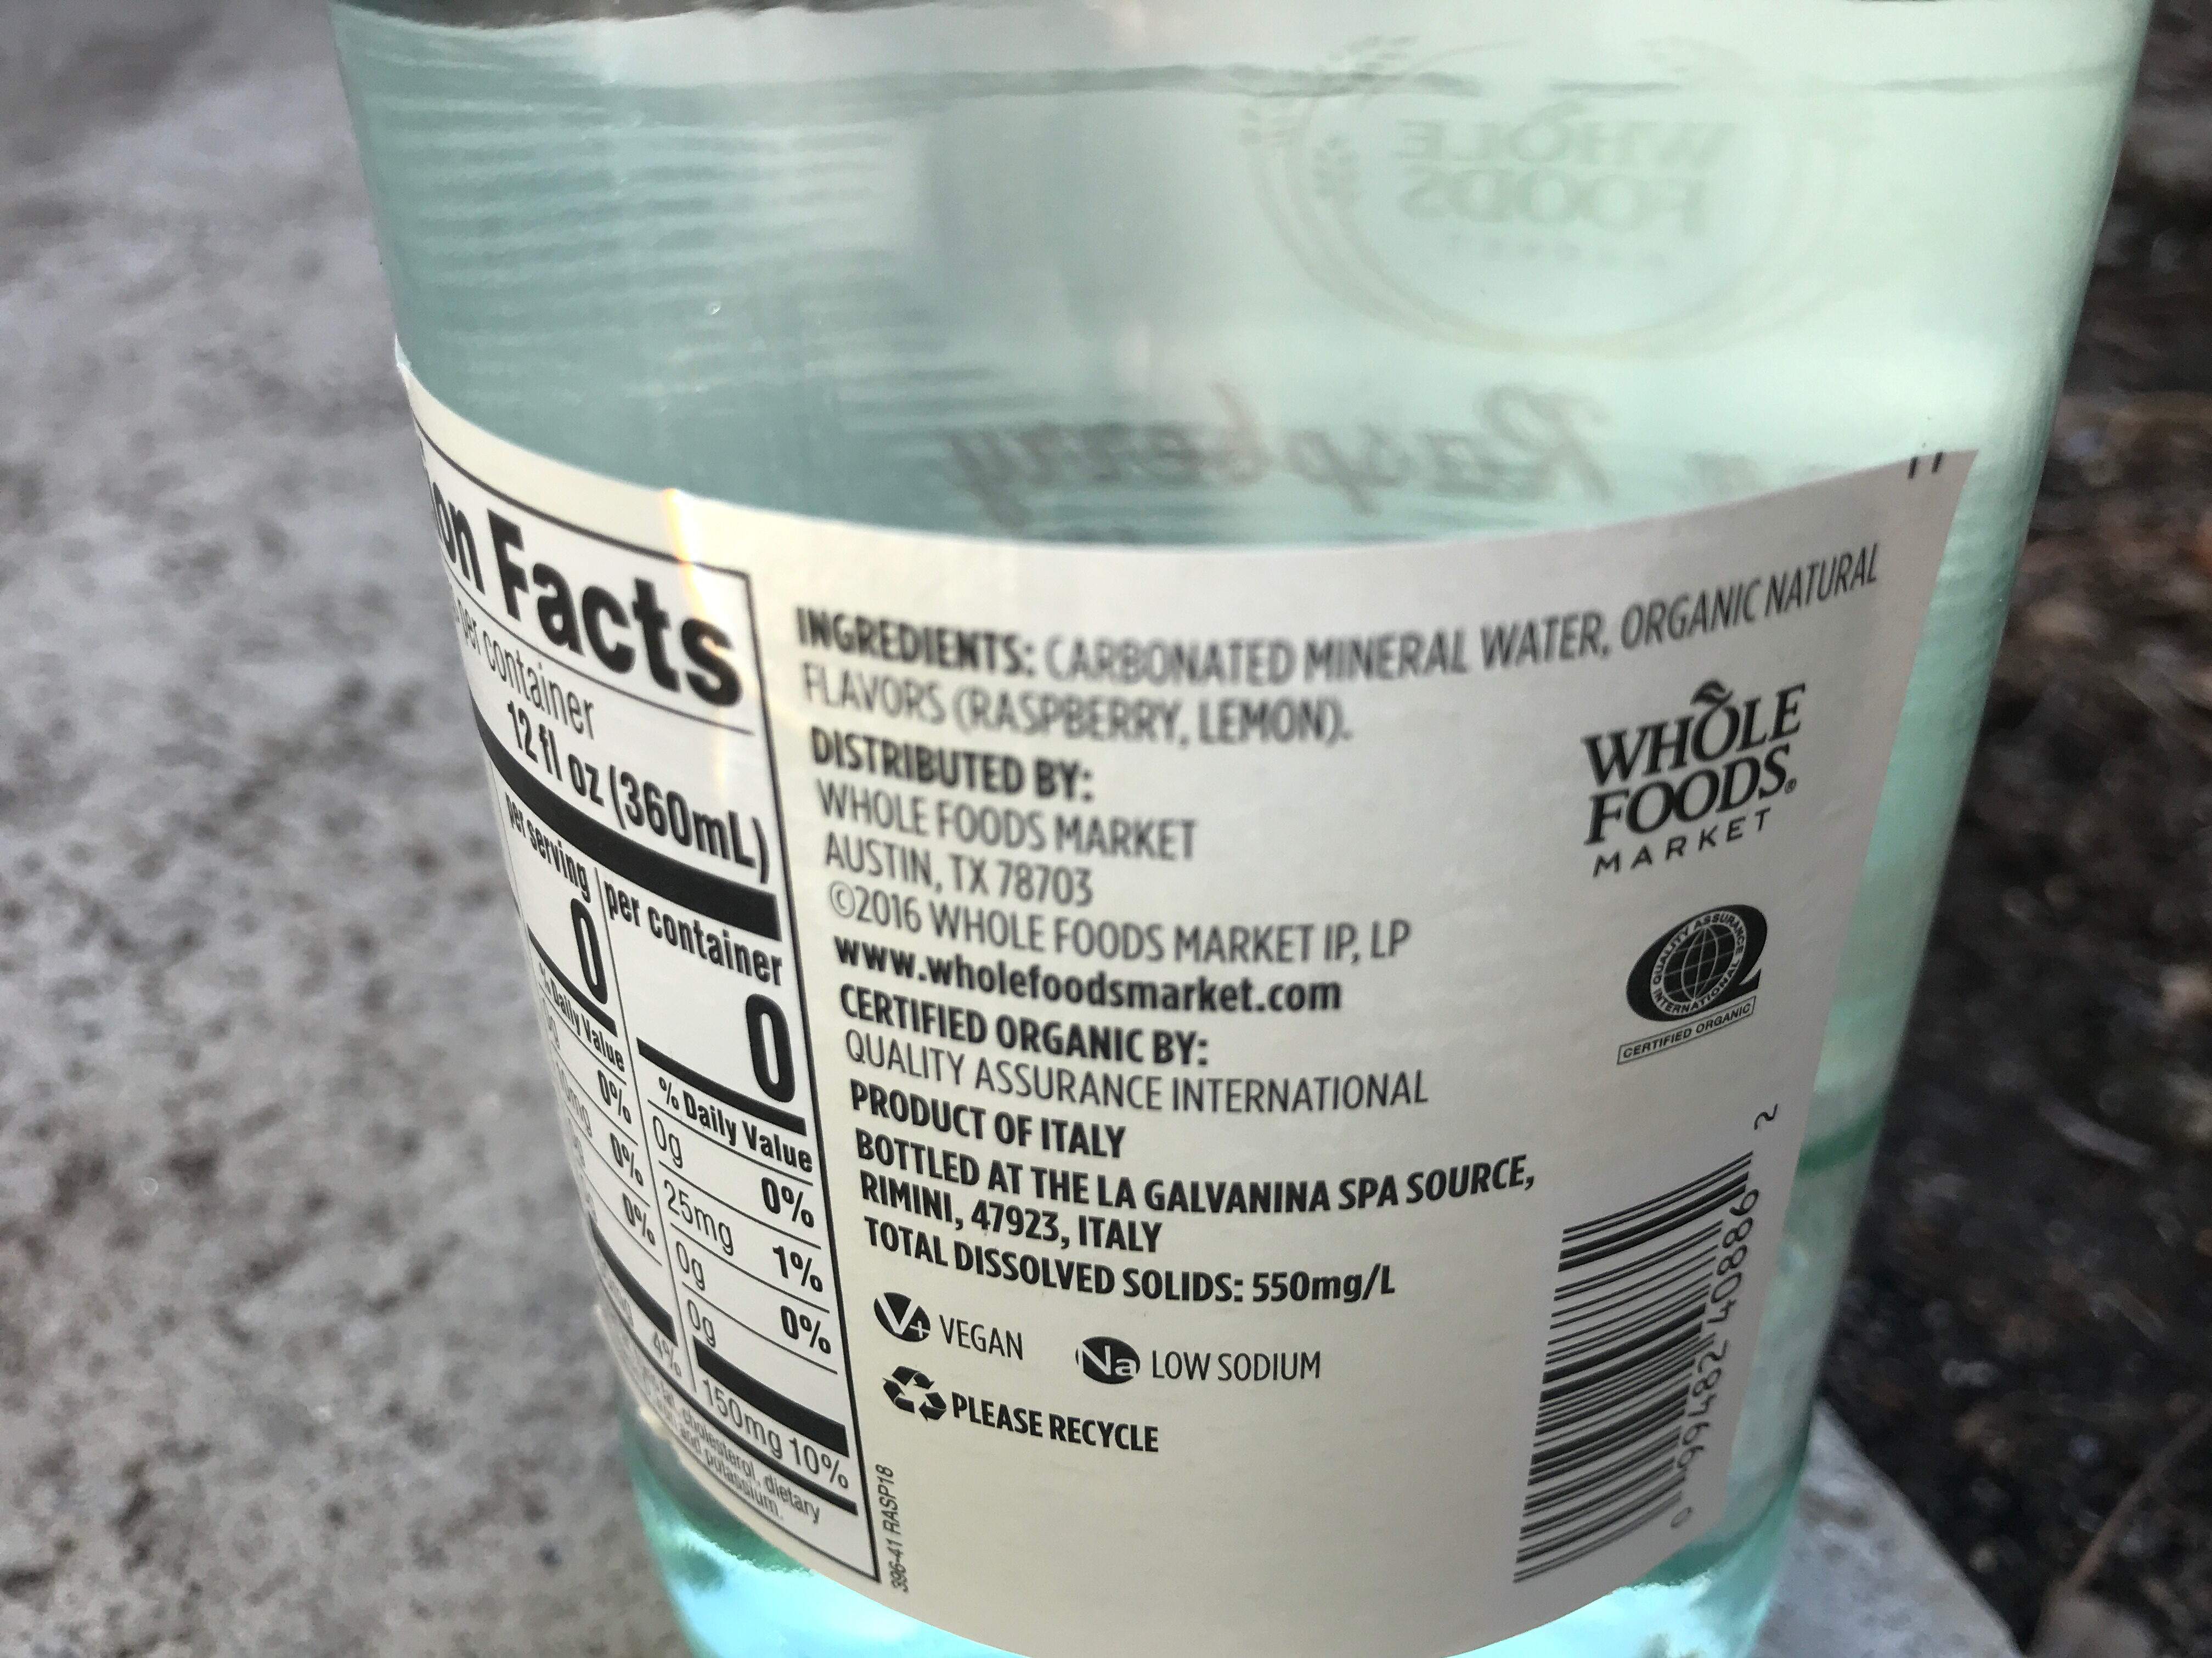 Lemon raspberry italian sparkling mineral water - Ingredients - en